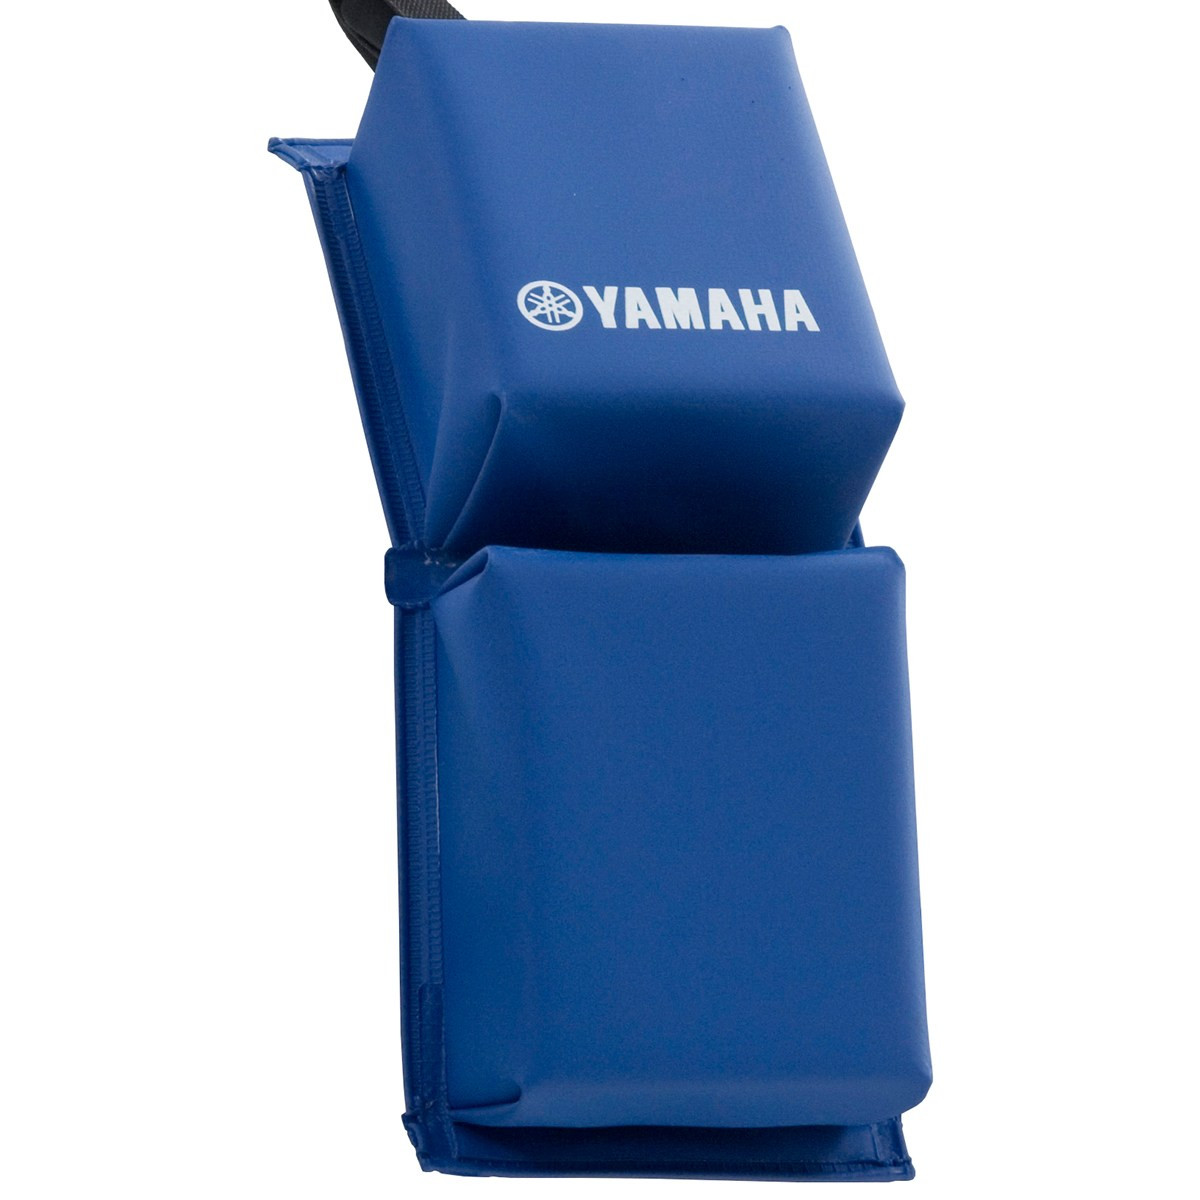 Yamaha Waverunner Contour Fender Blue or Black MWV-WVRNR-HH